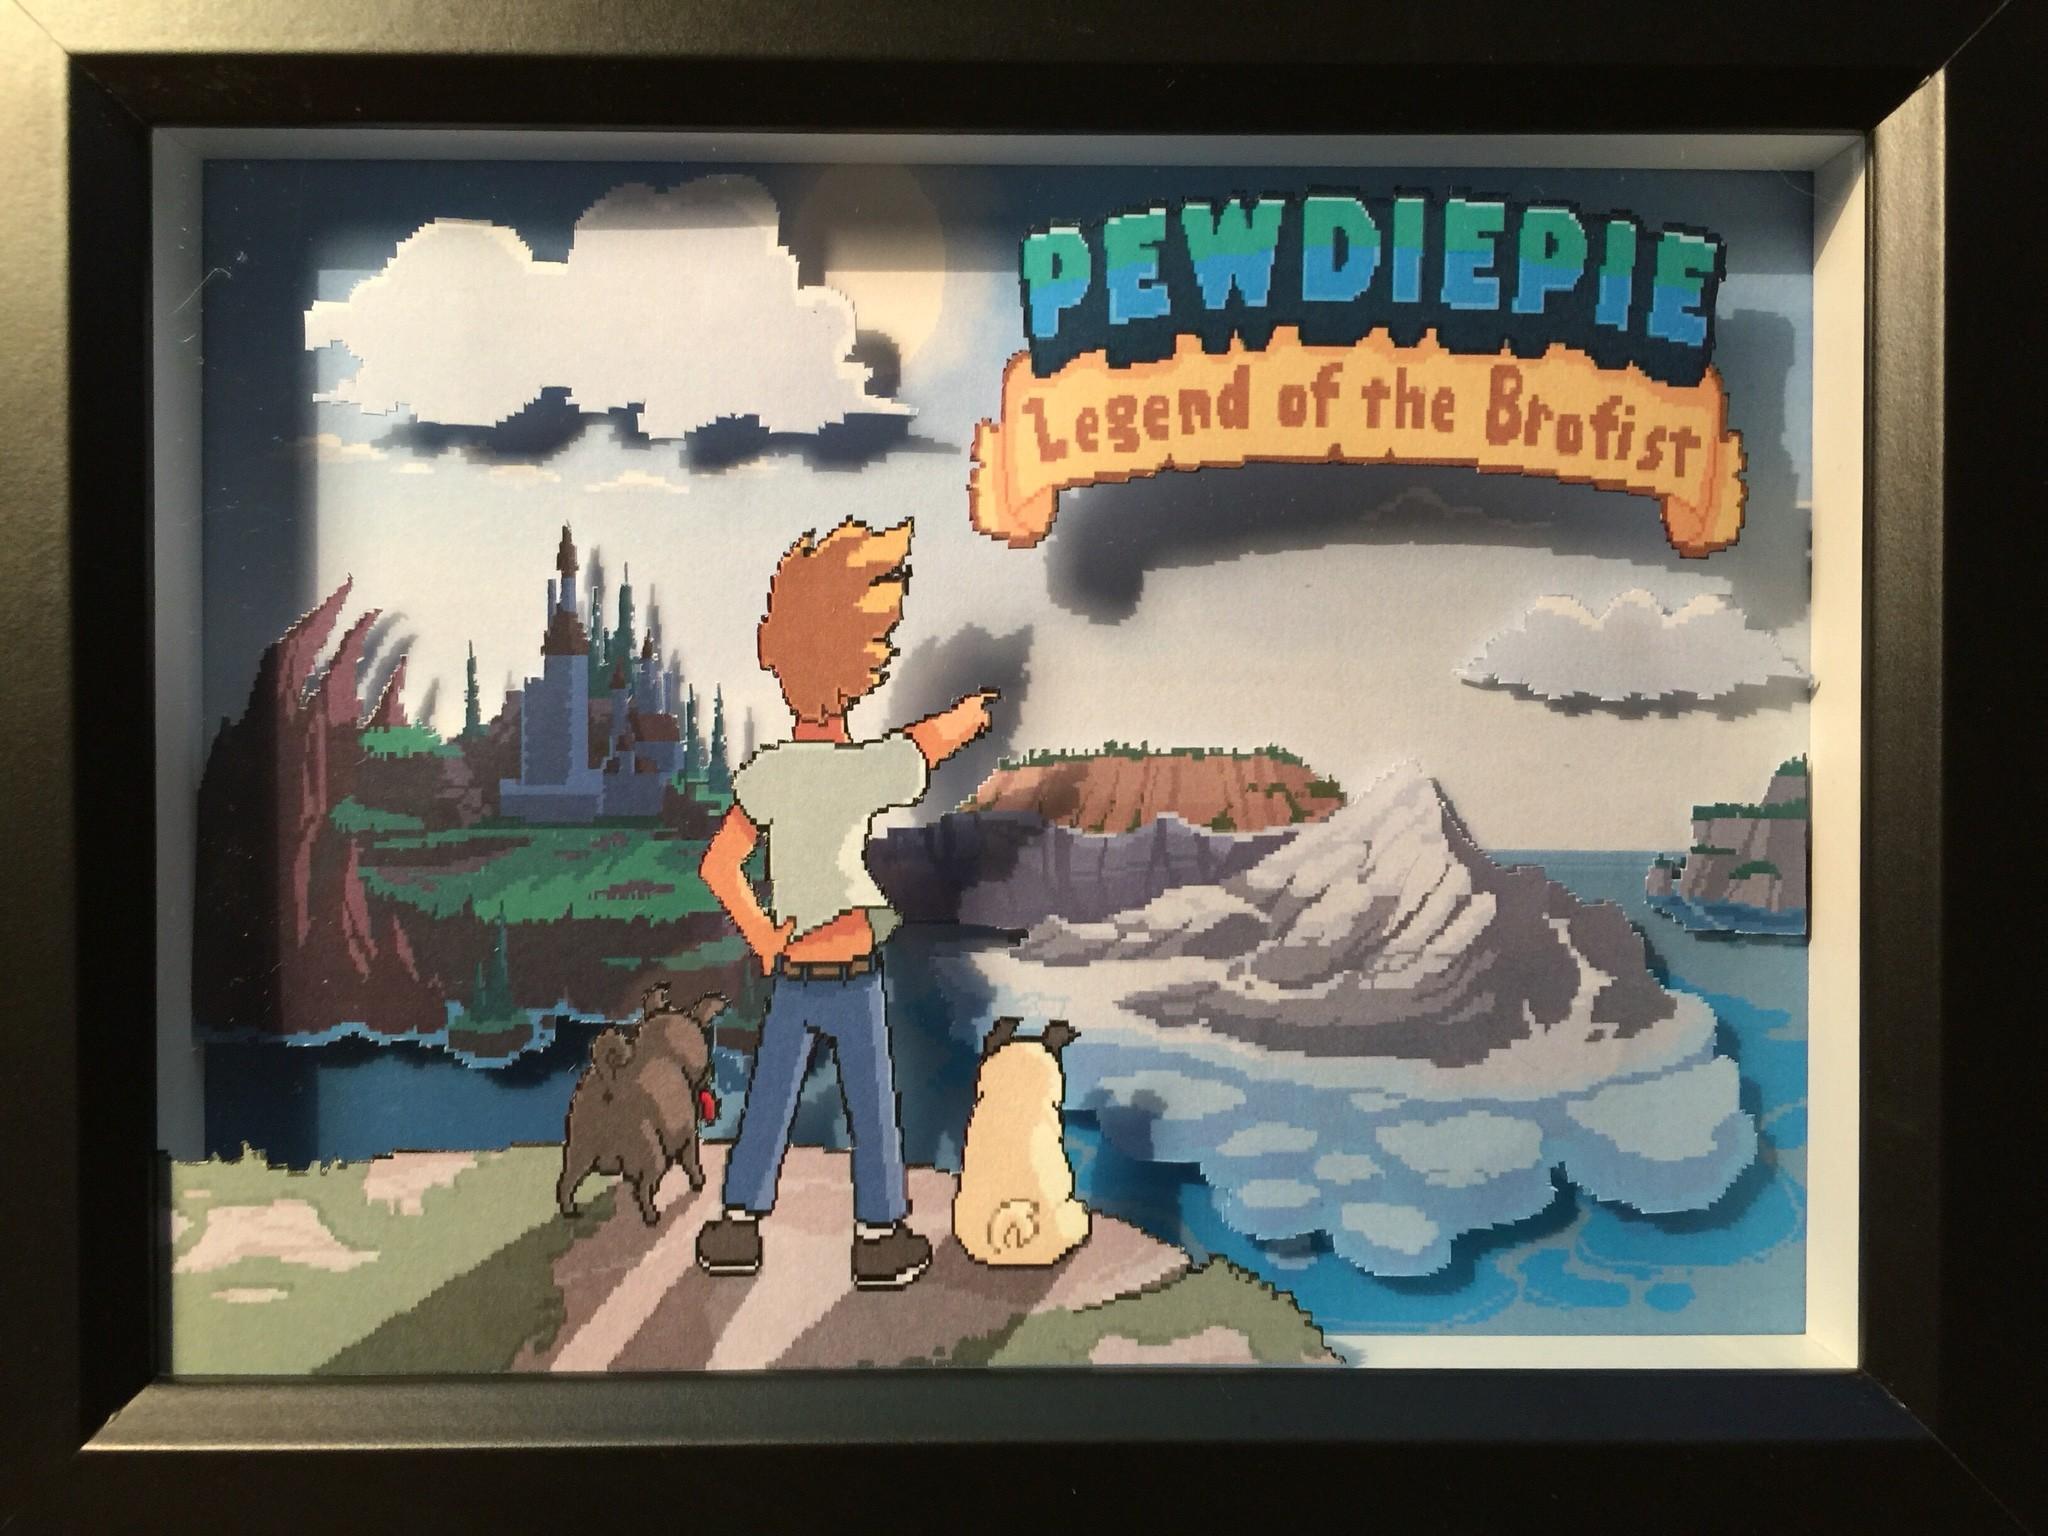 Pewdiepie Legend of the Brofist Diorama